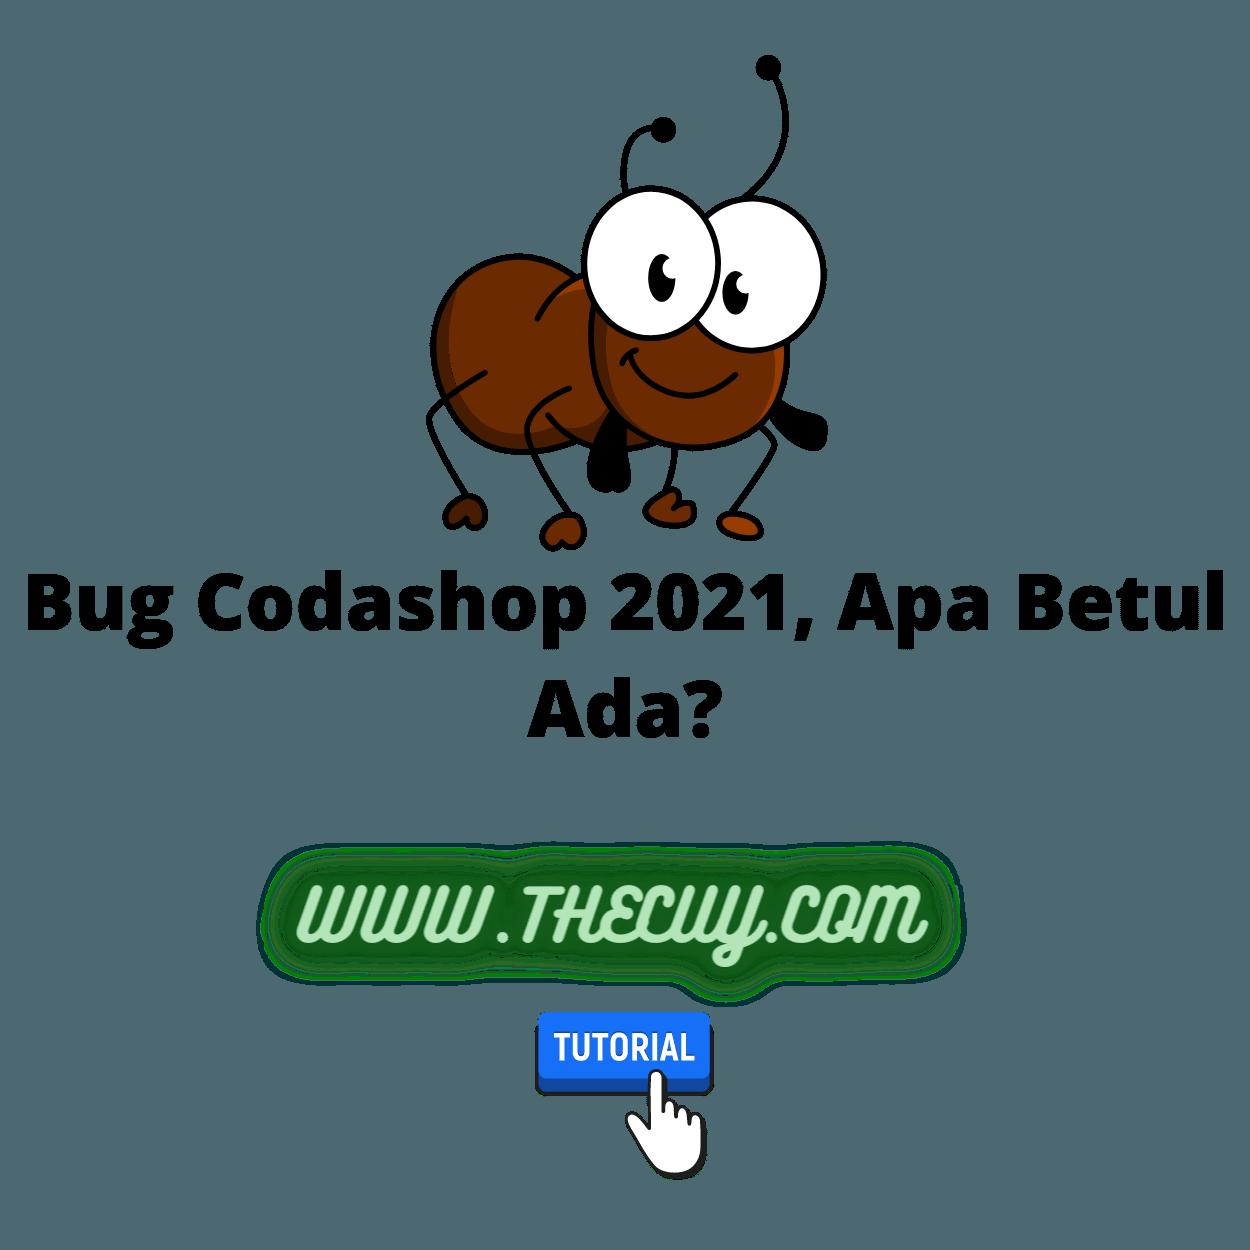 Bug Codashop 2021, Apa Betul Ada?